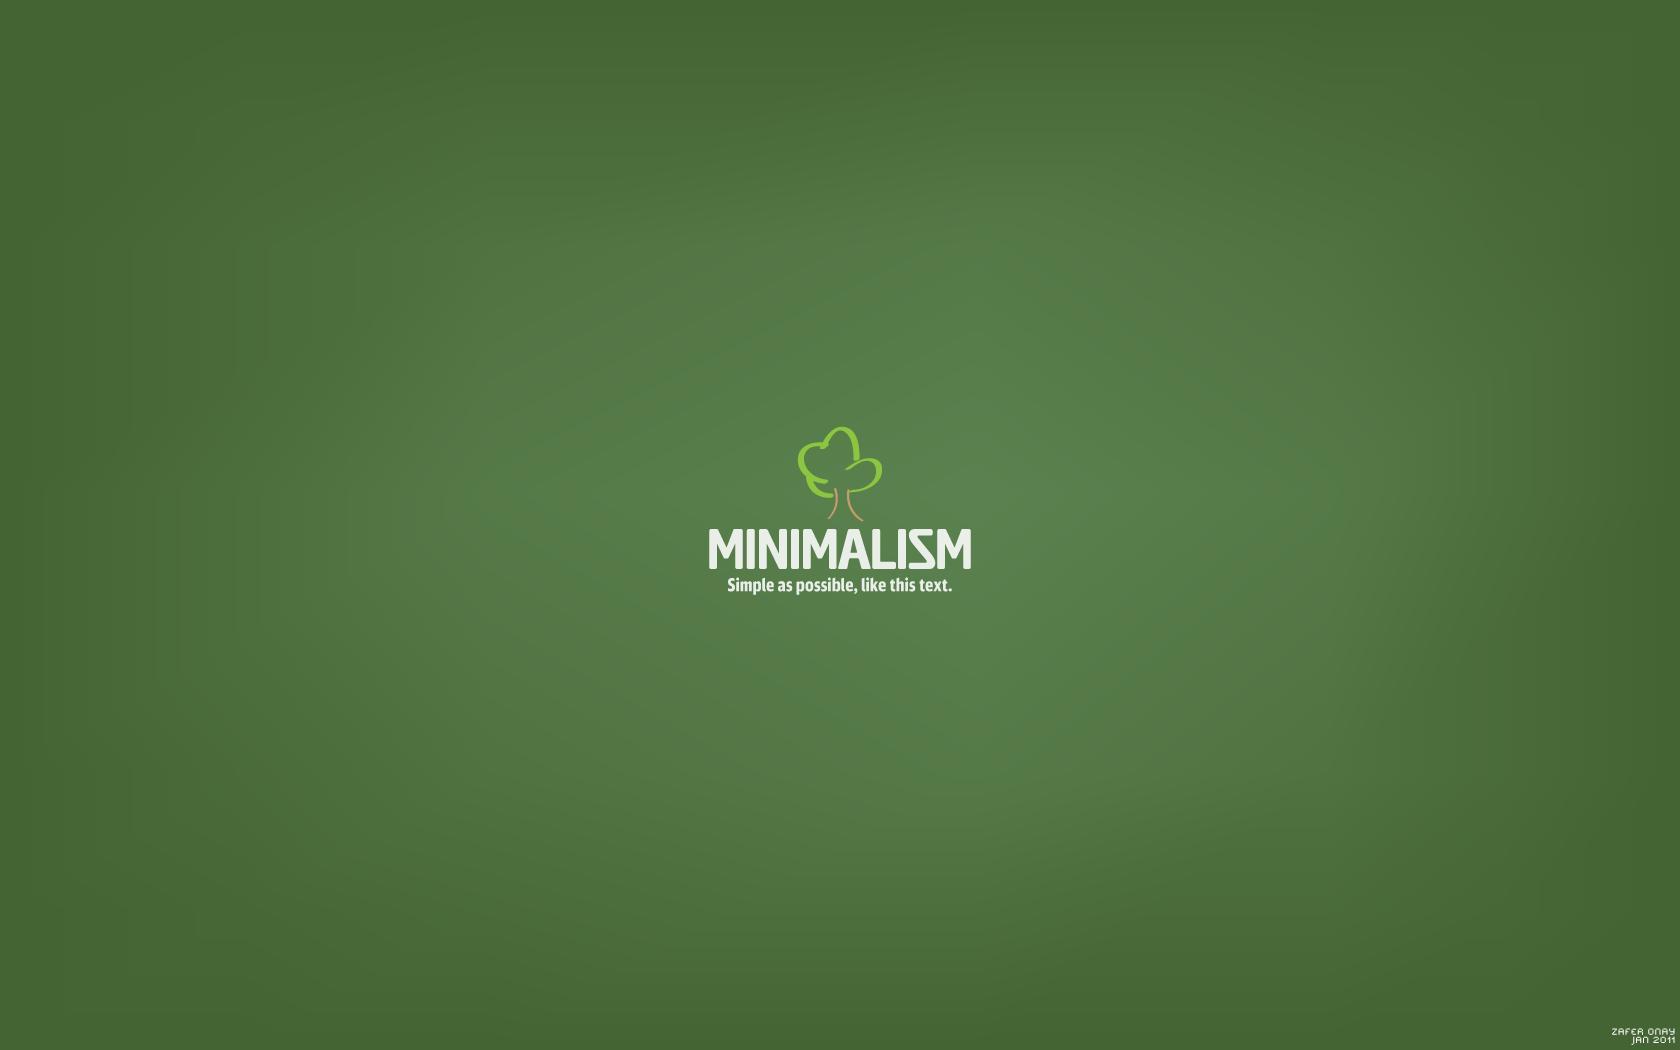 Minimalism wallpapers Minimalism stock photos 1680x1050